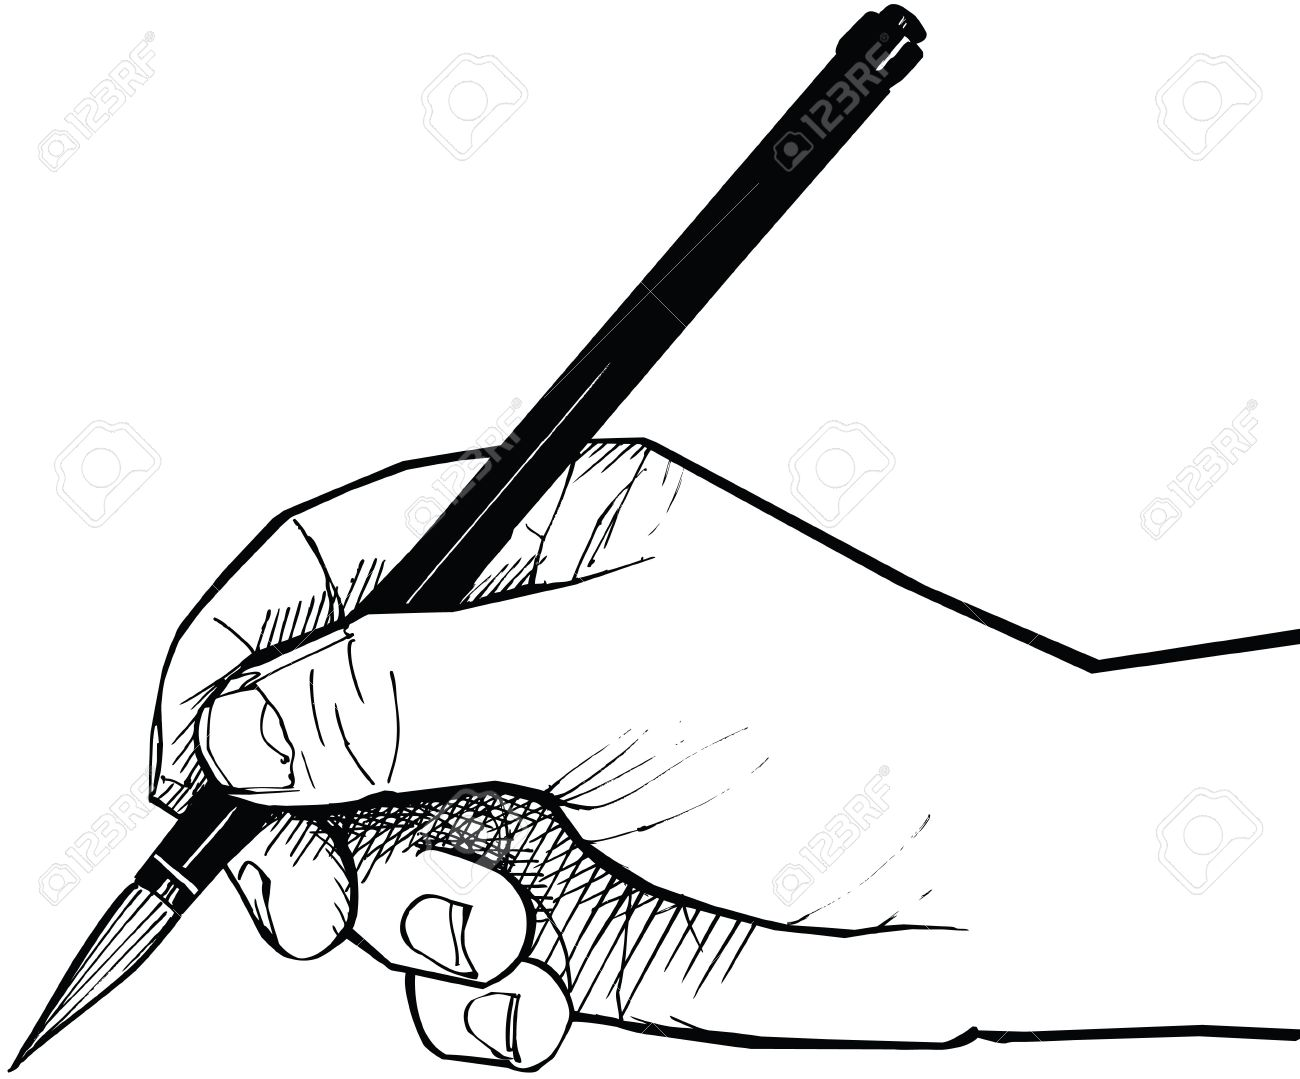 Brush Drawing at GetDrawings